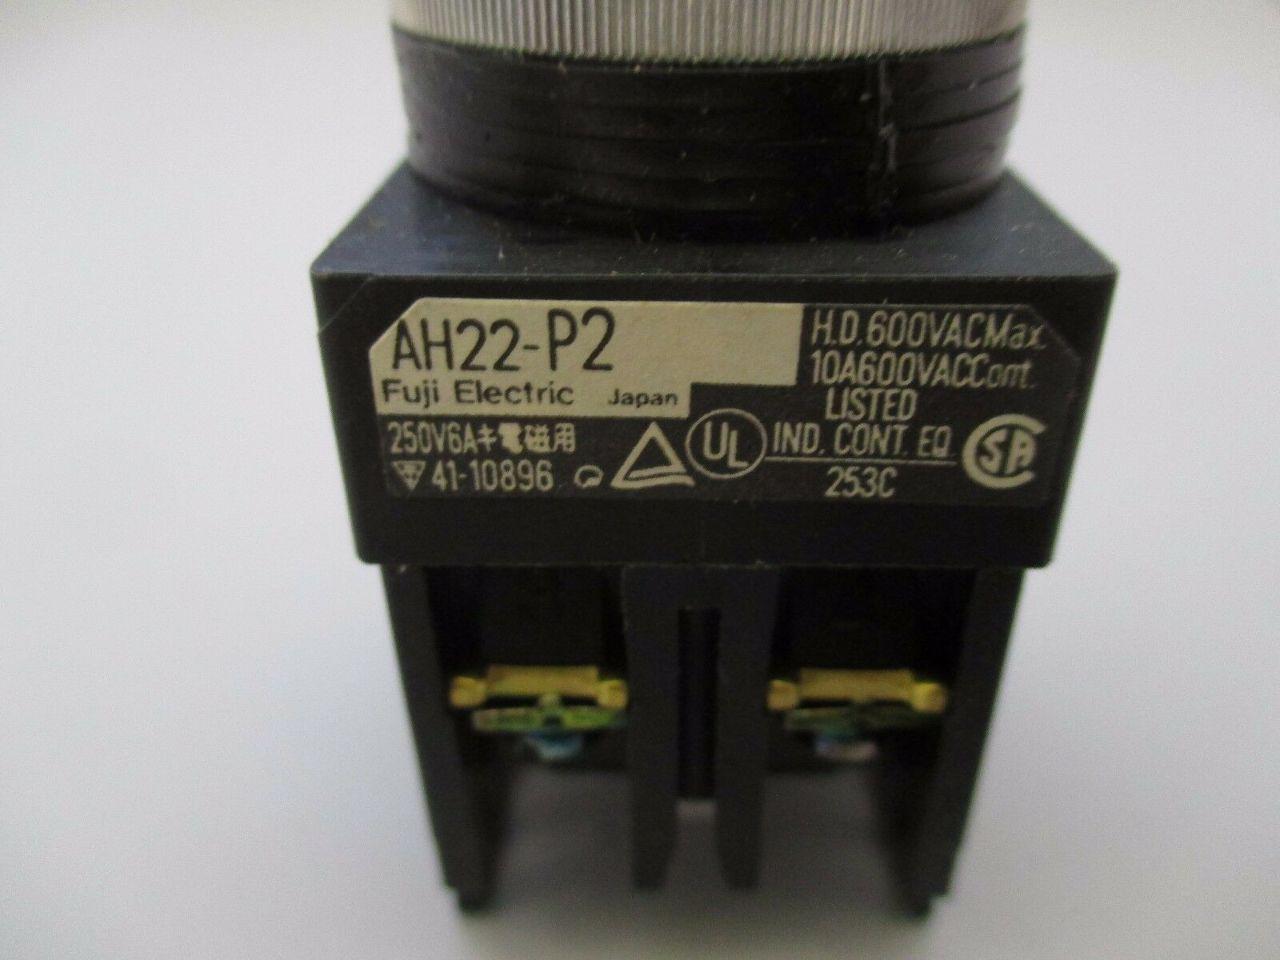 FUJI ELECTRIC AH22-P2 NSNP